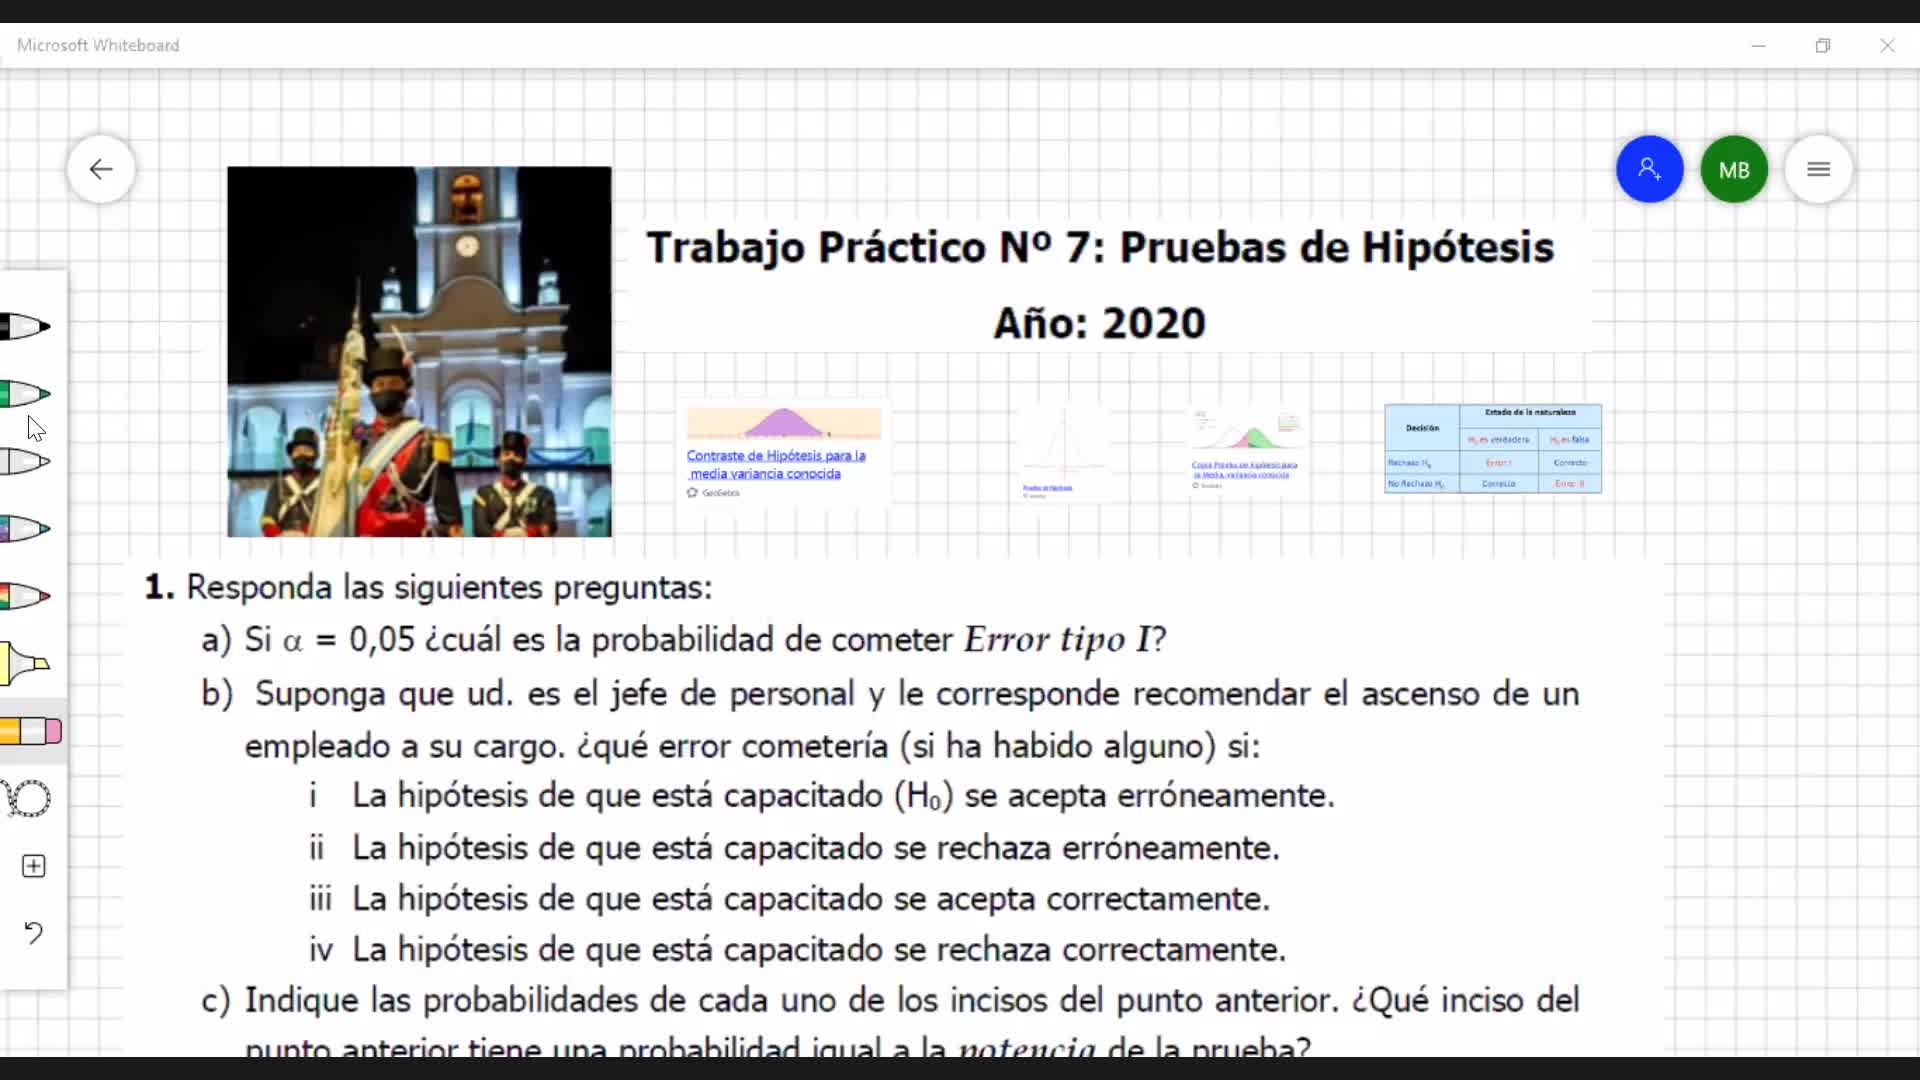 2020-05-25 Clase práctica Pt.1